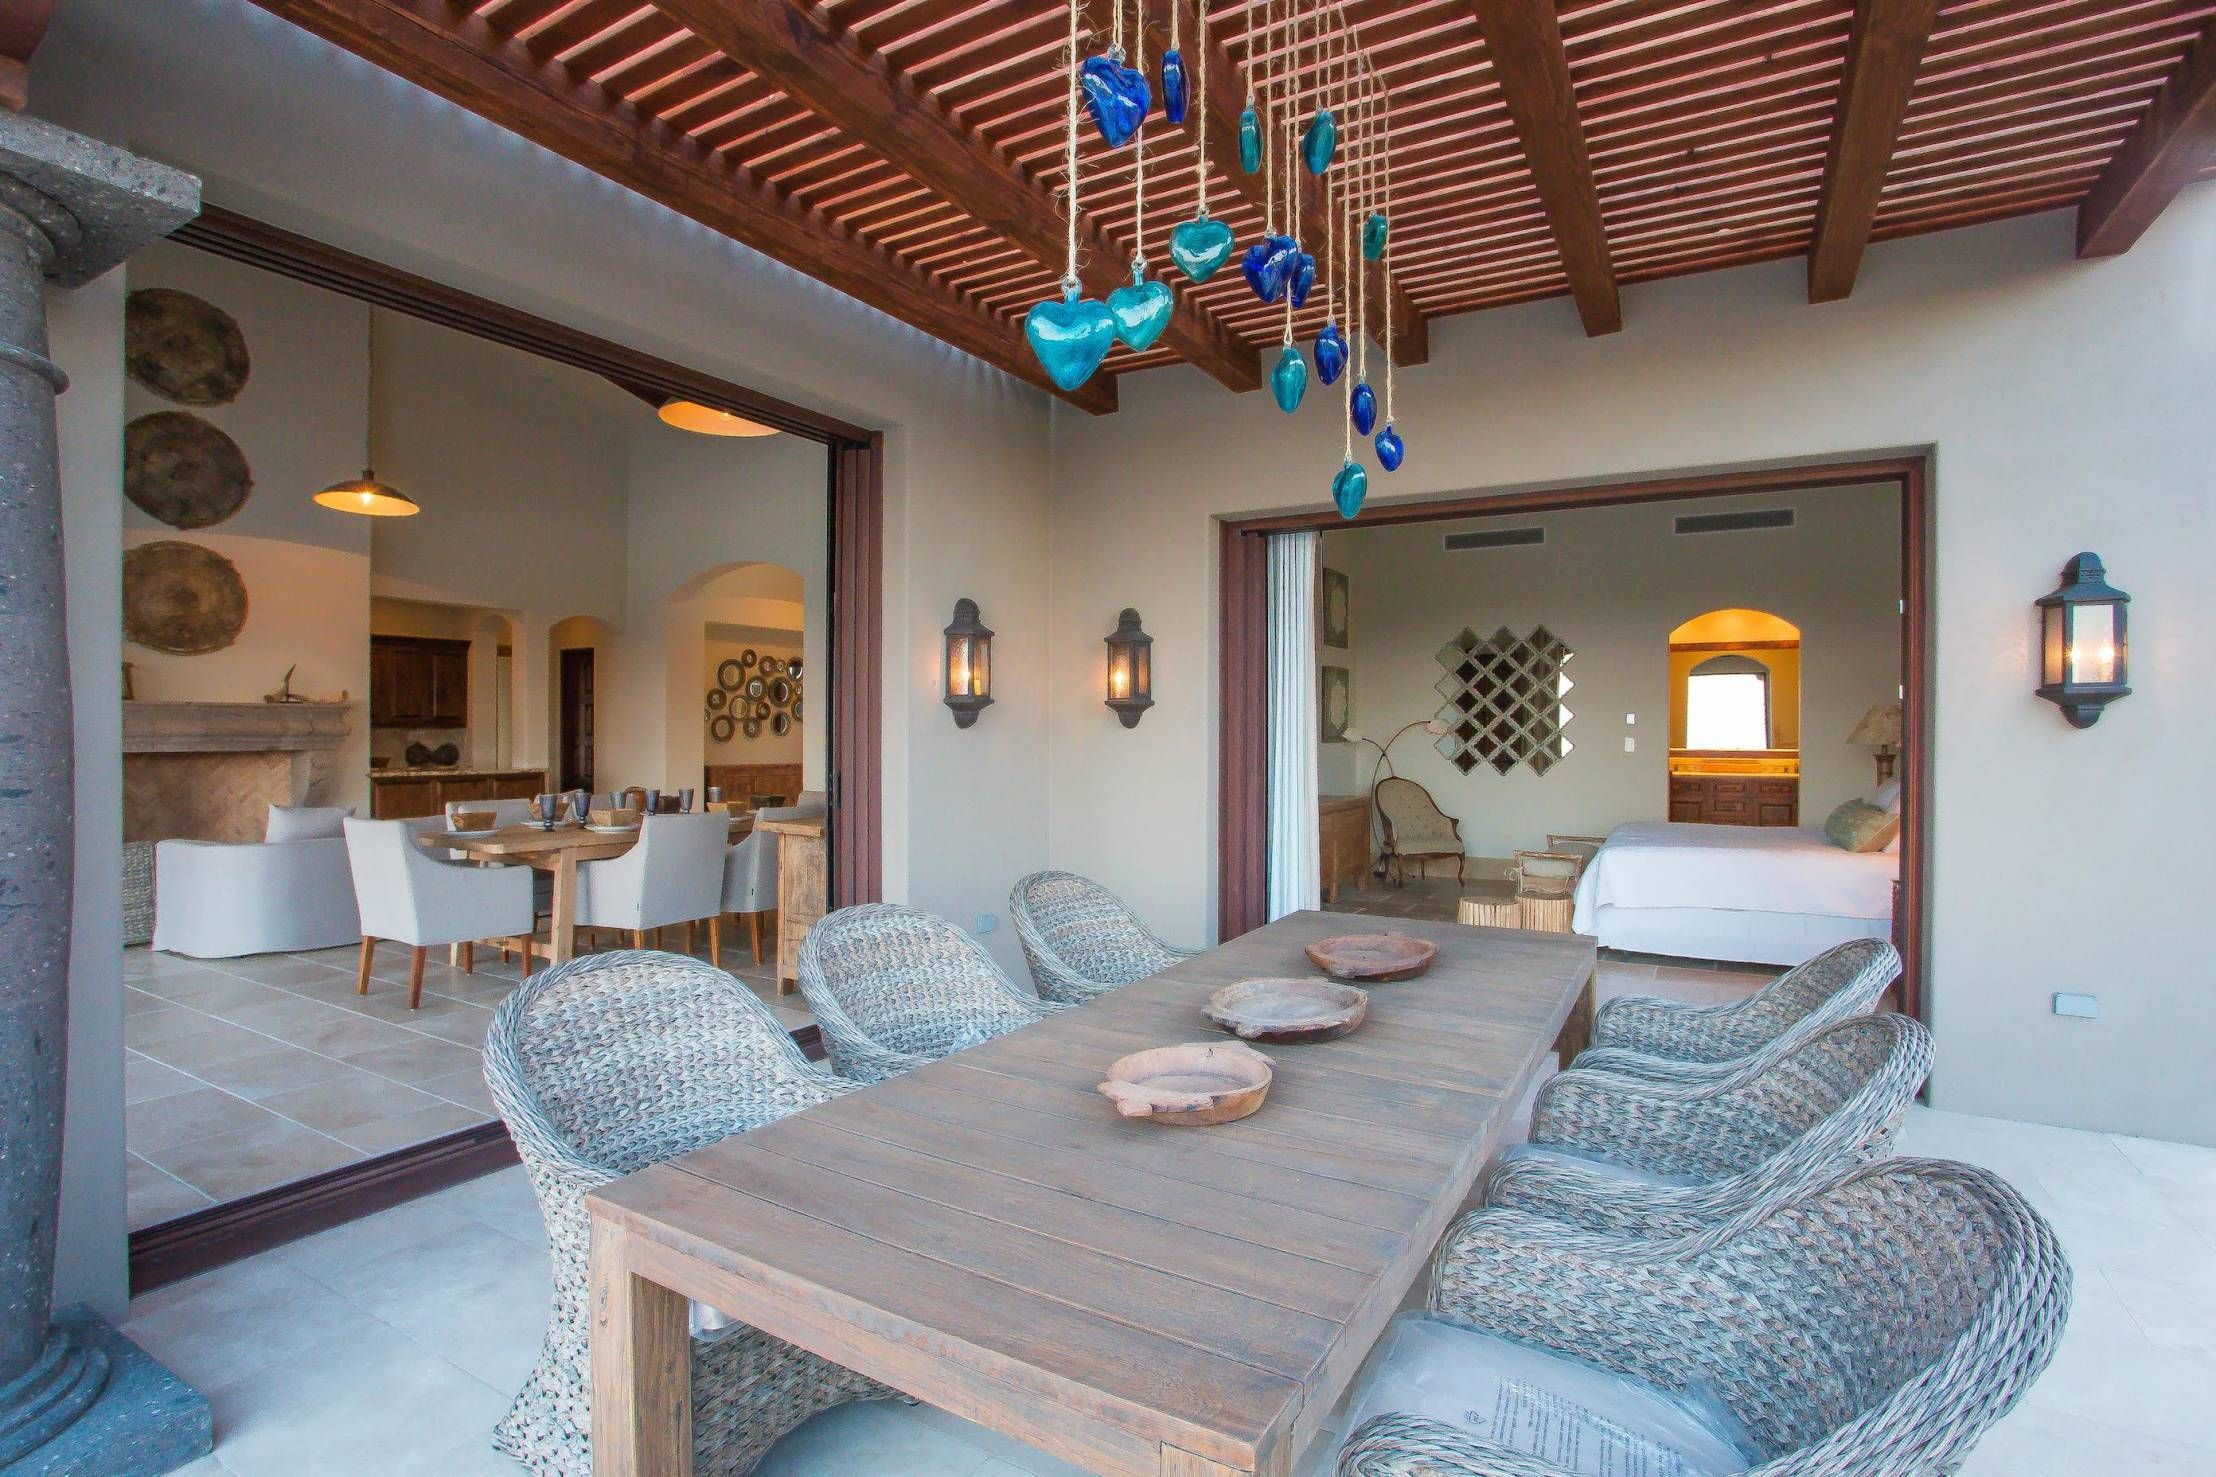 15 terrazas r sticas sensacionales ideas para el hogar for Decoracion de casas de playa modernas